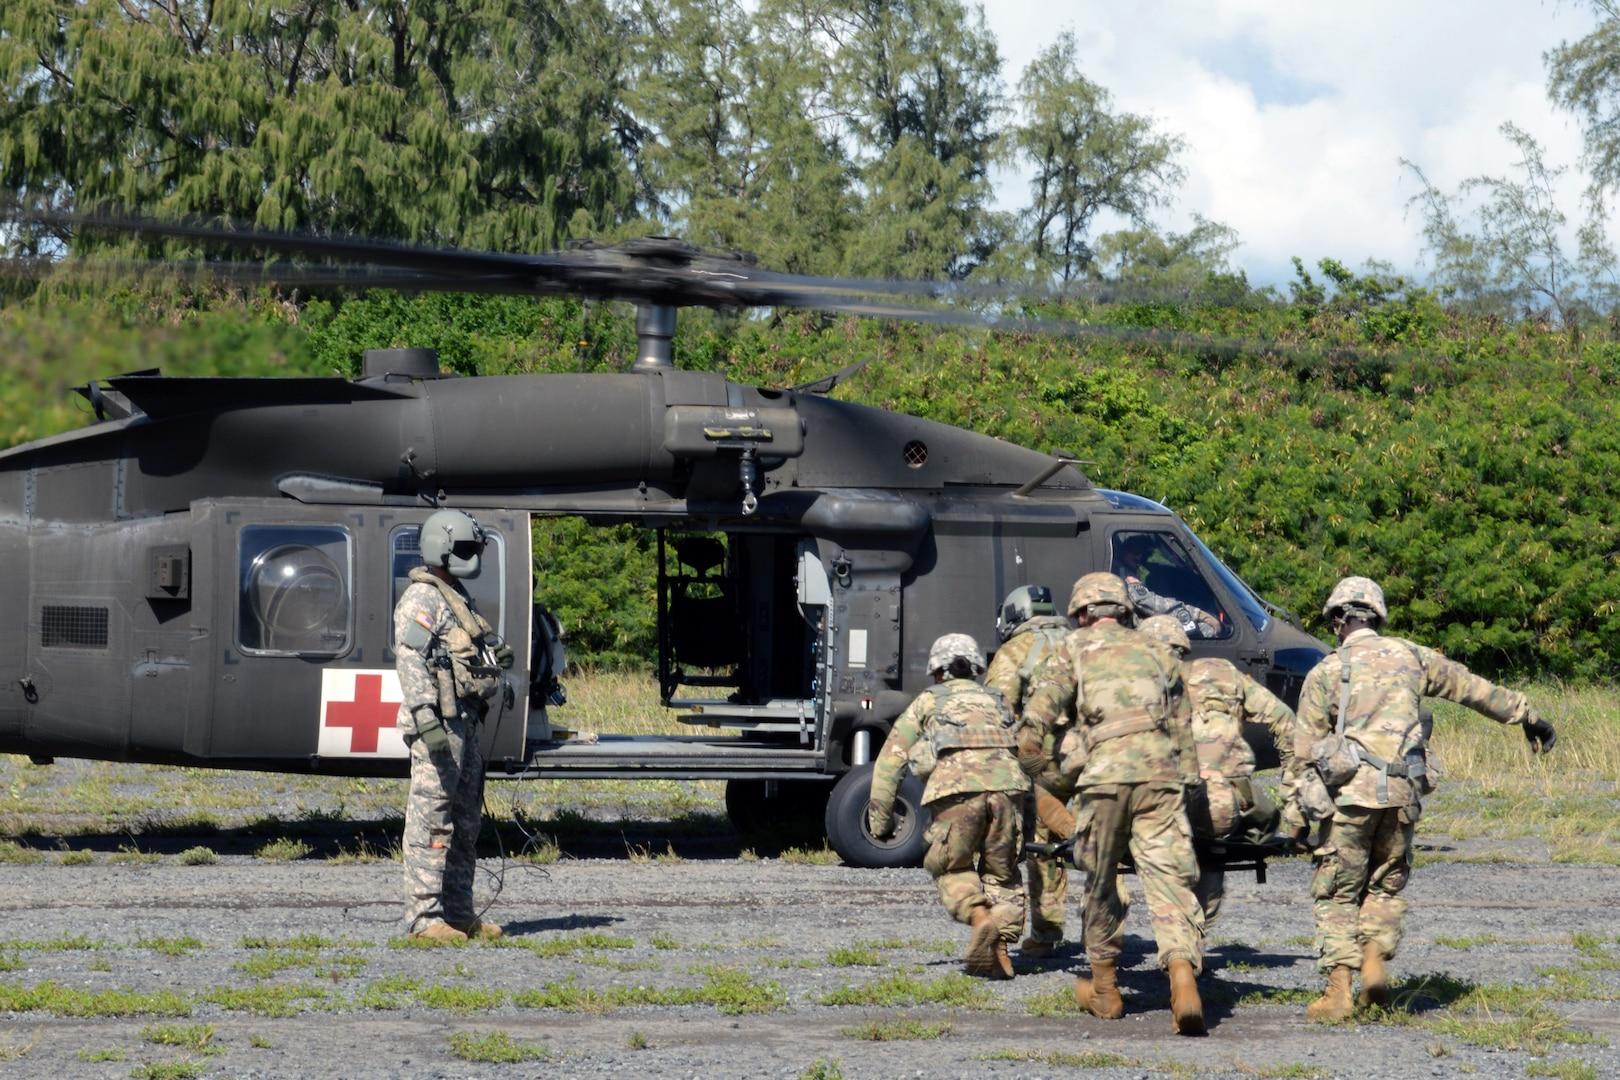 Training on Black Hawk